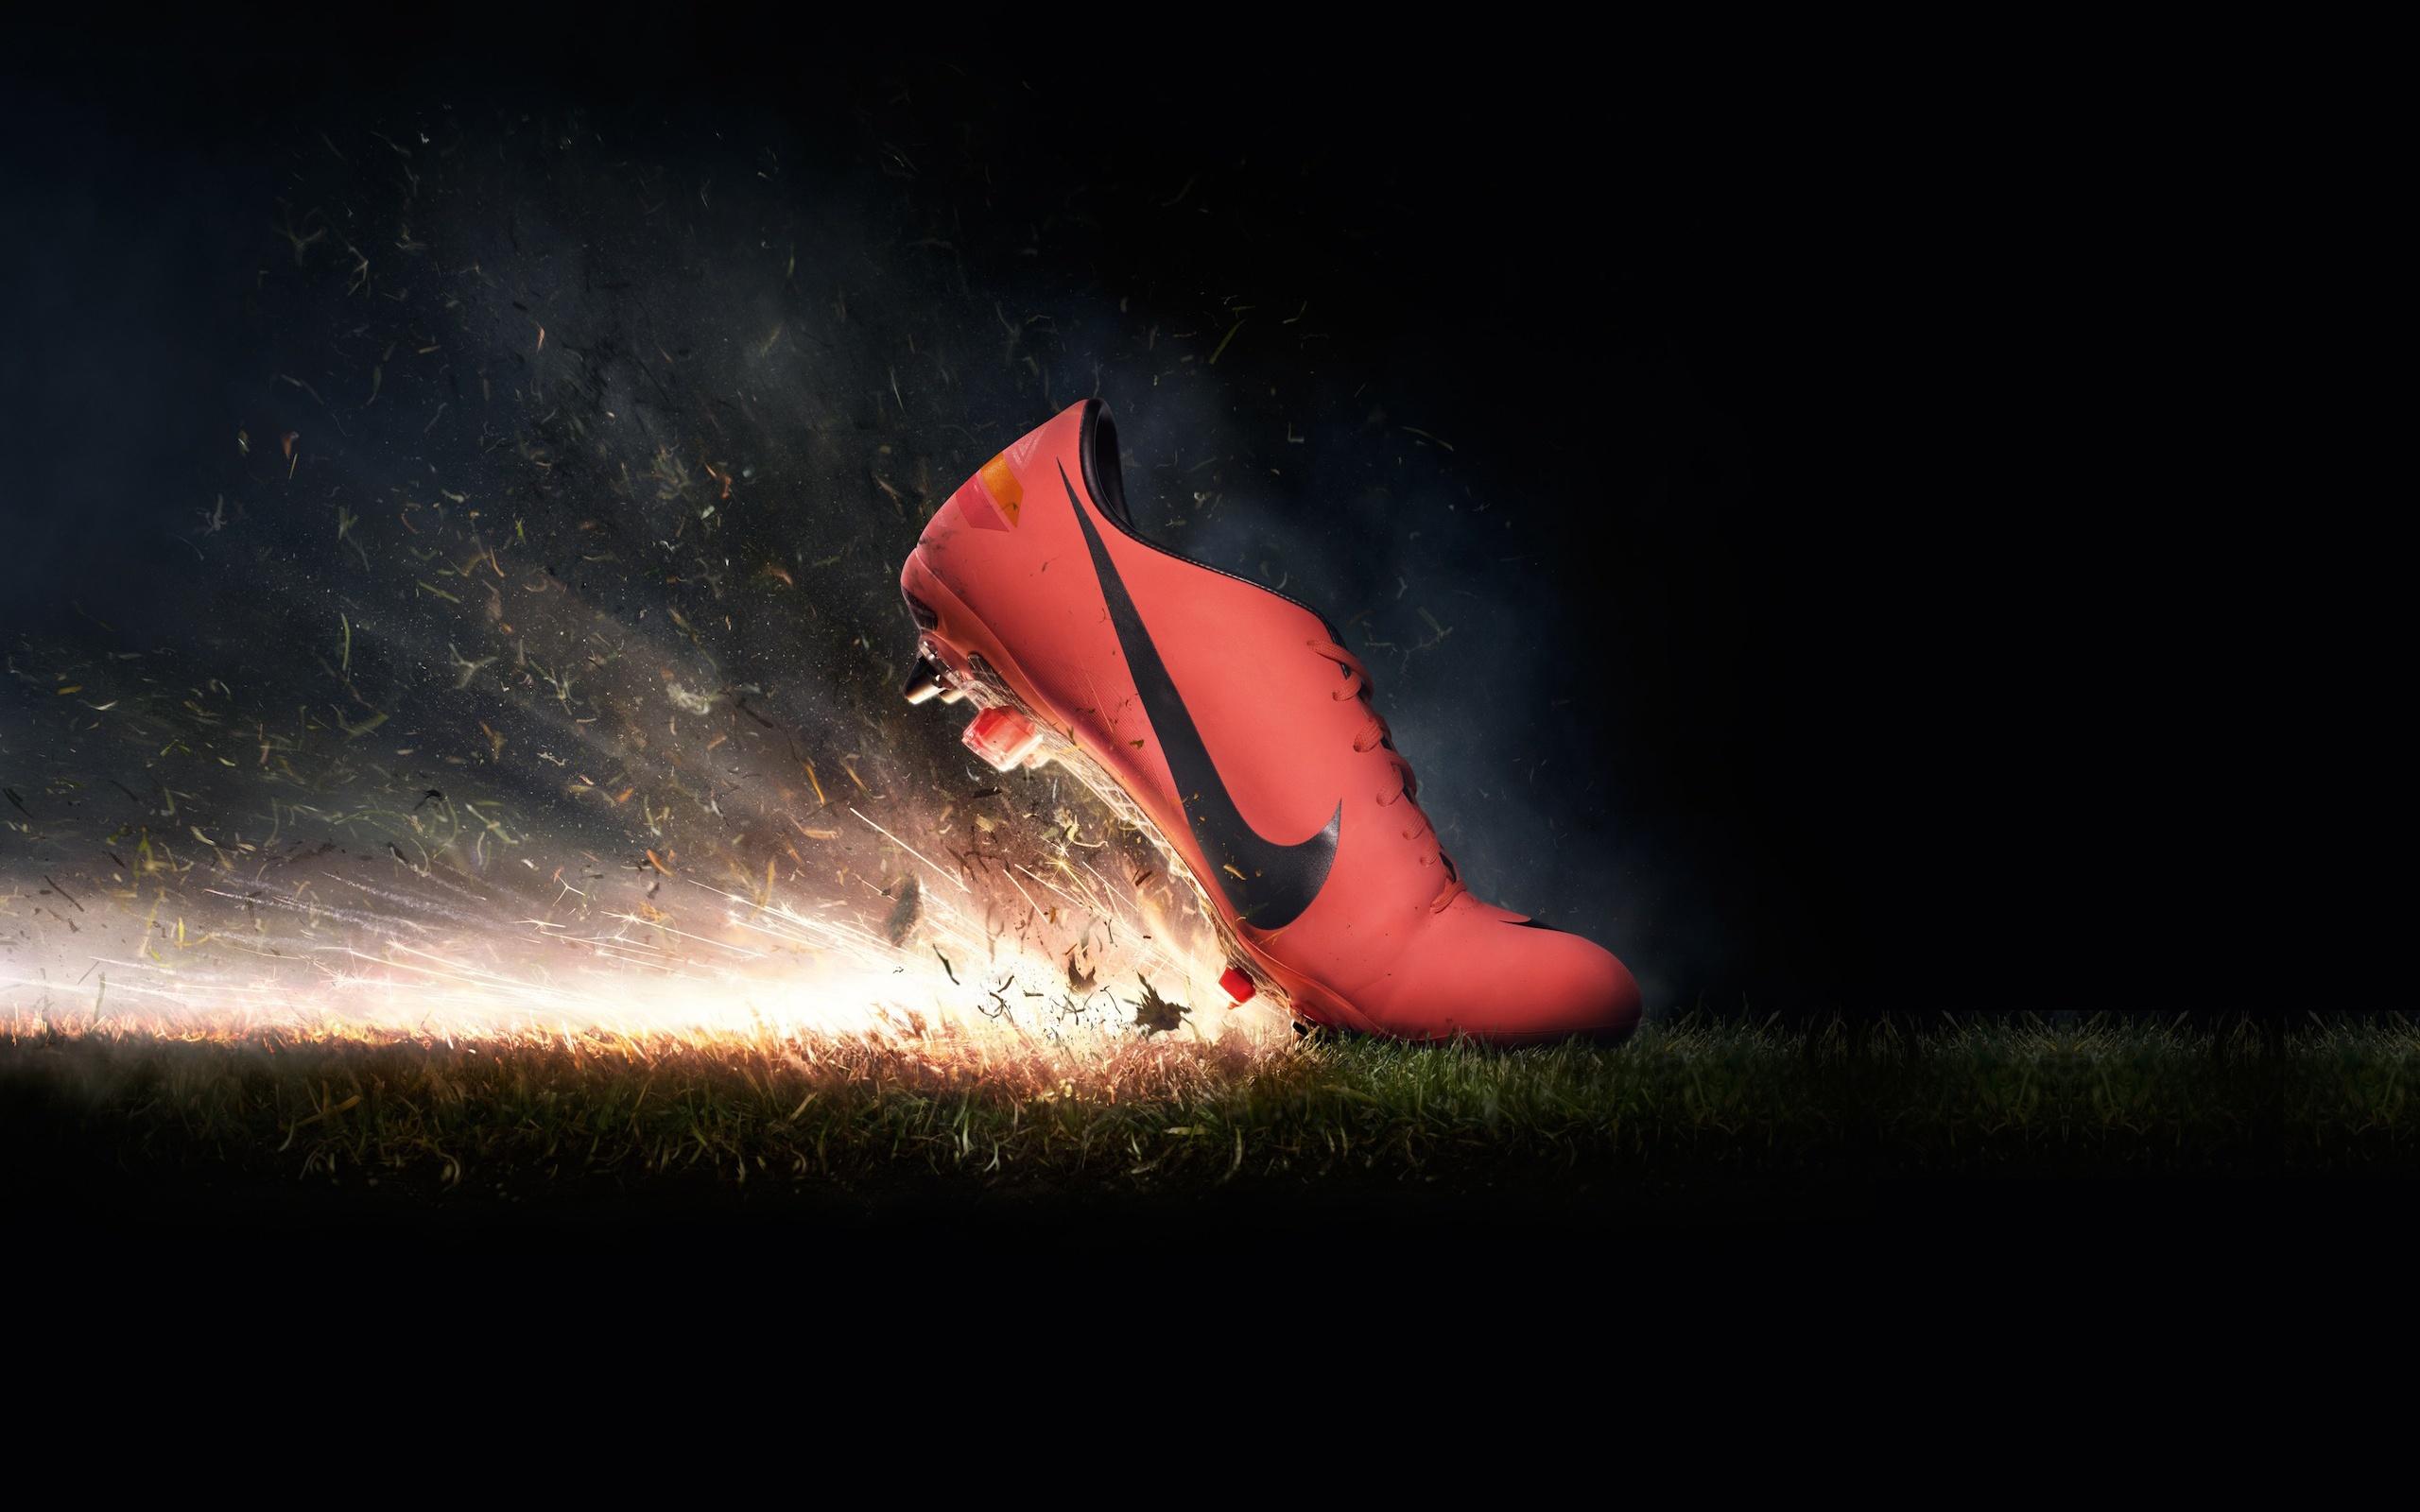 Кросовок Nike  № 2550707 бесплатно